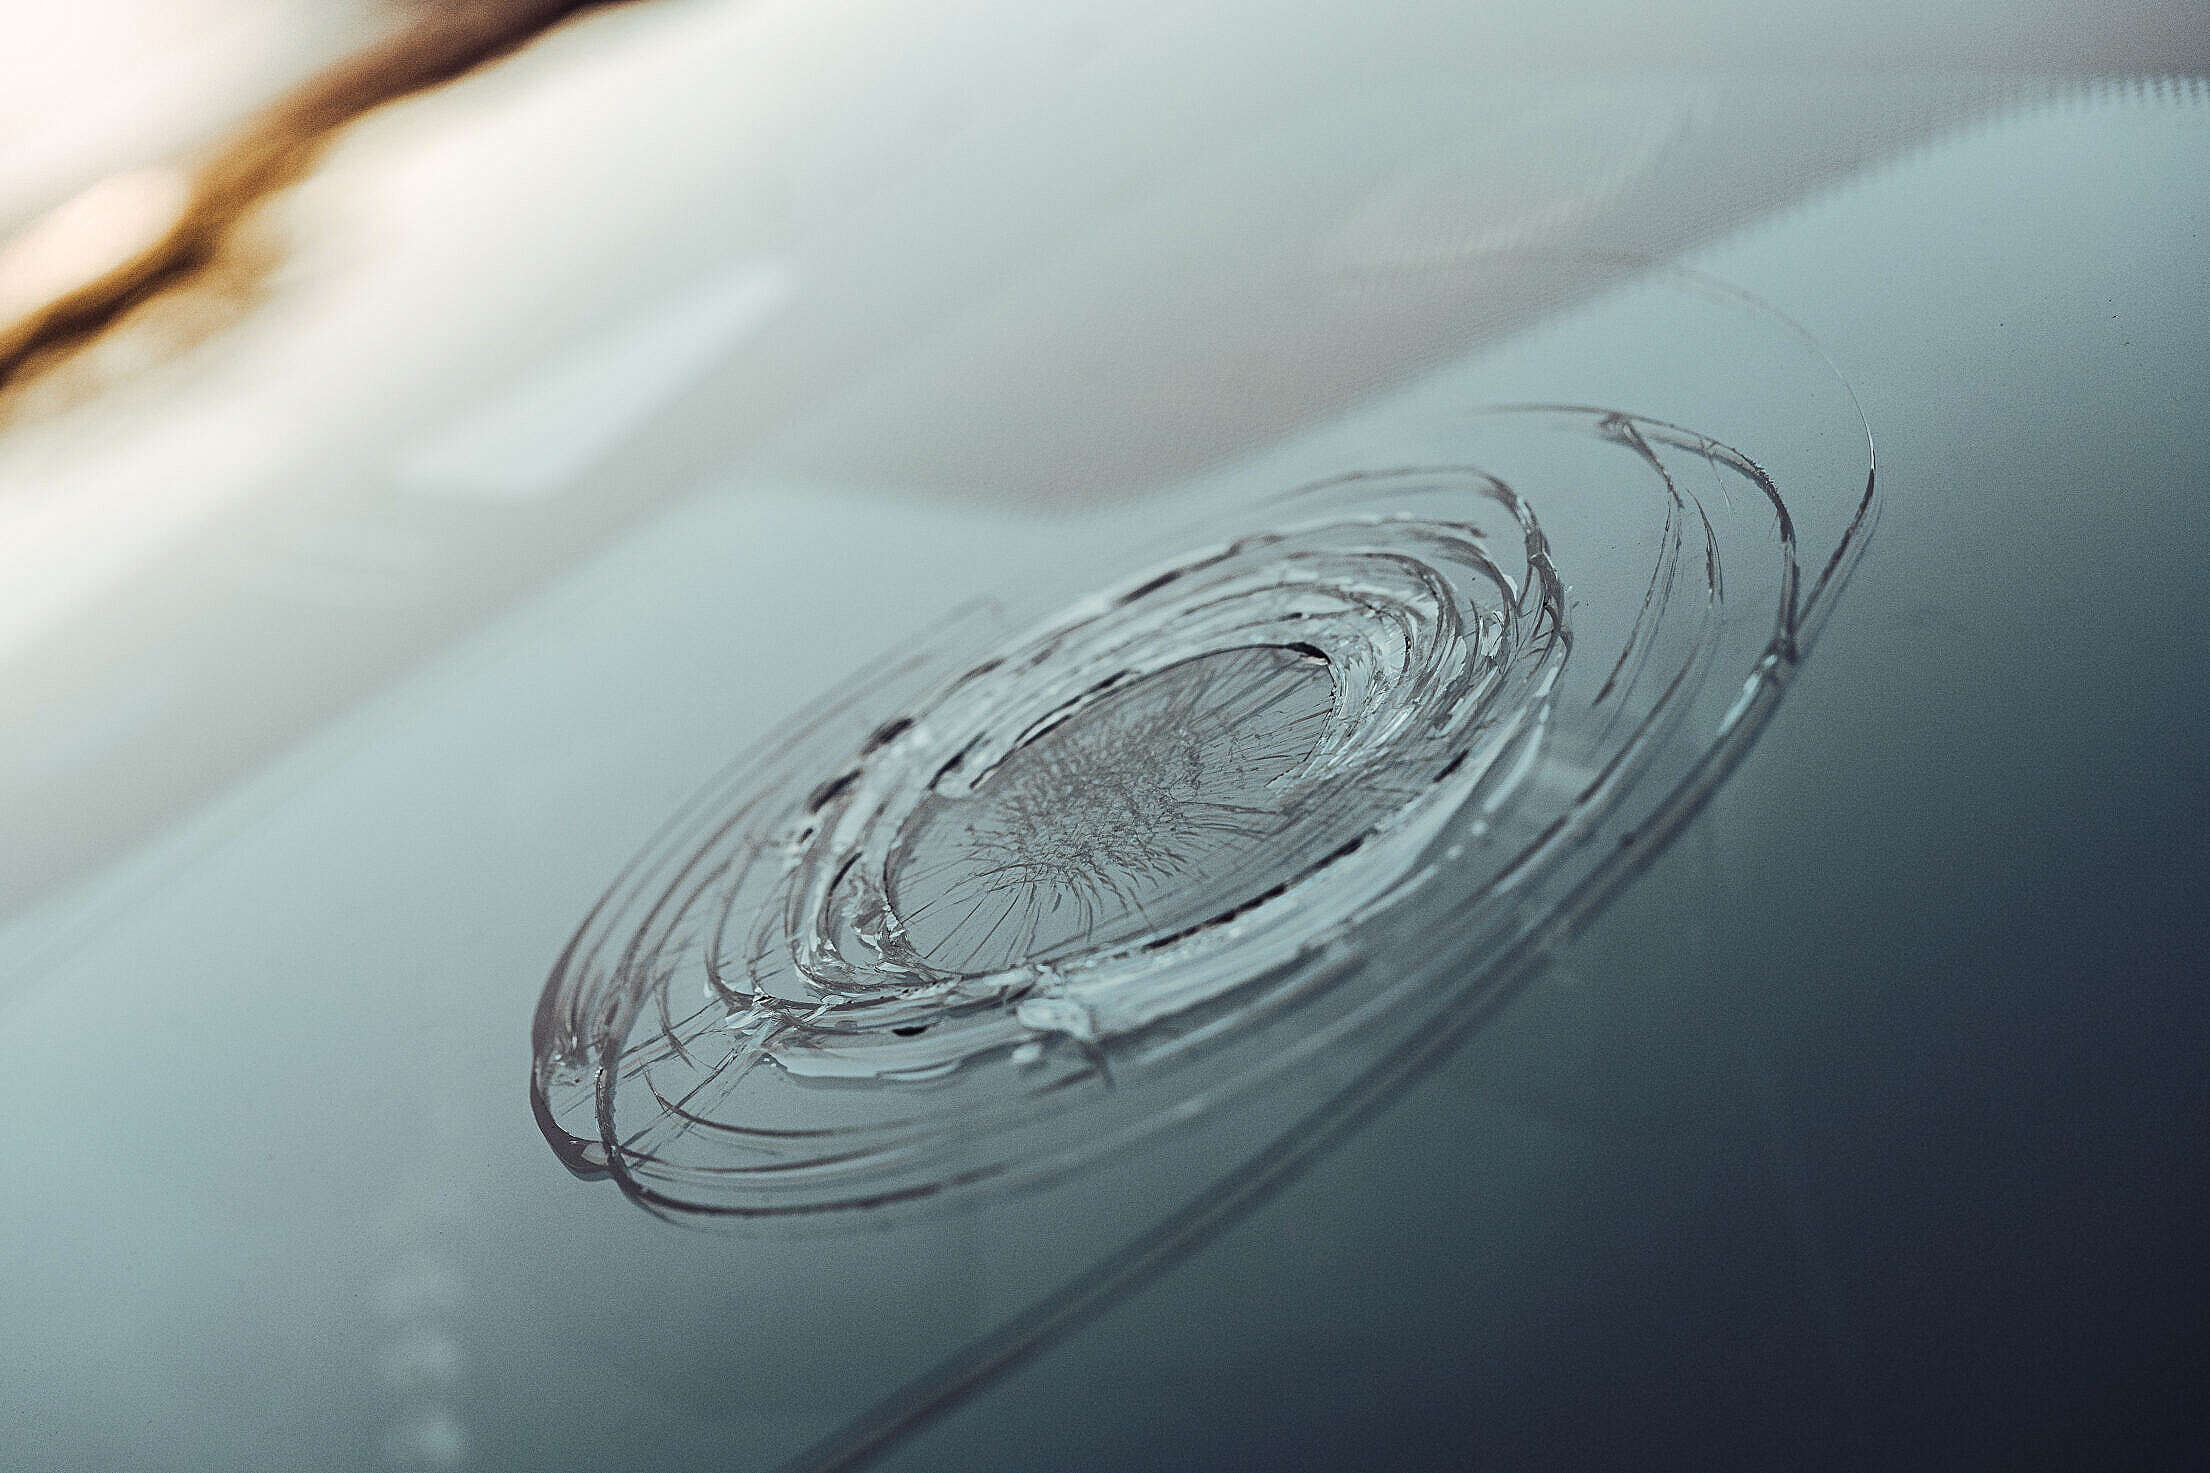 Hail Damaged Windshield of a Car Free Stock Photo